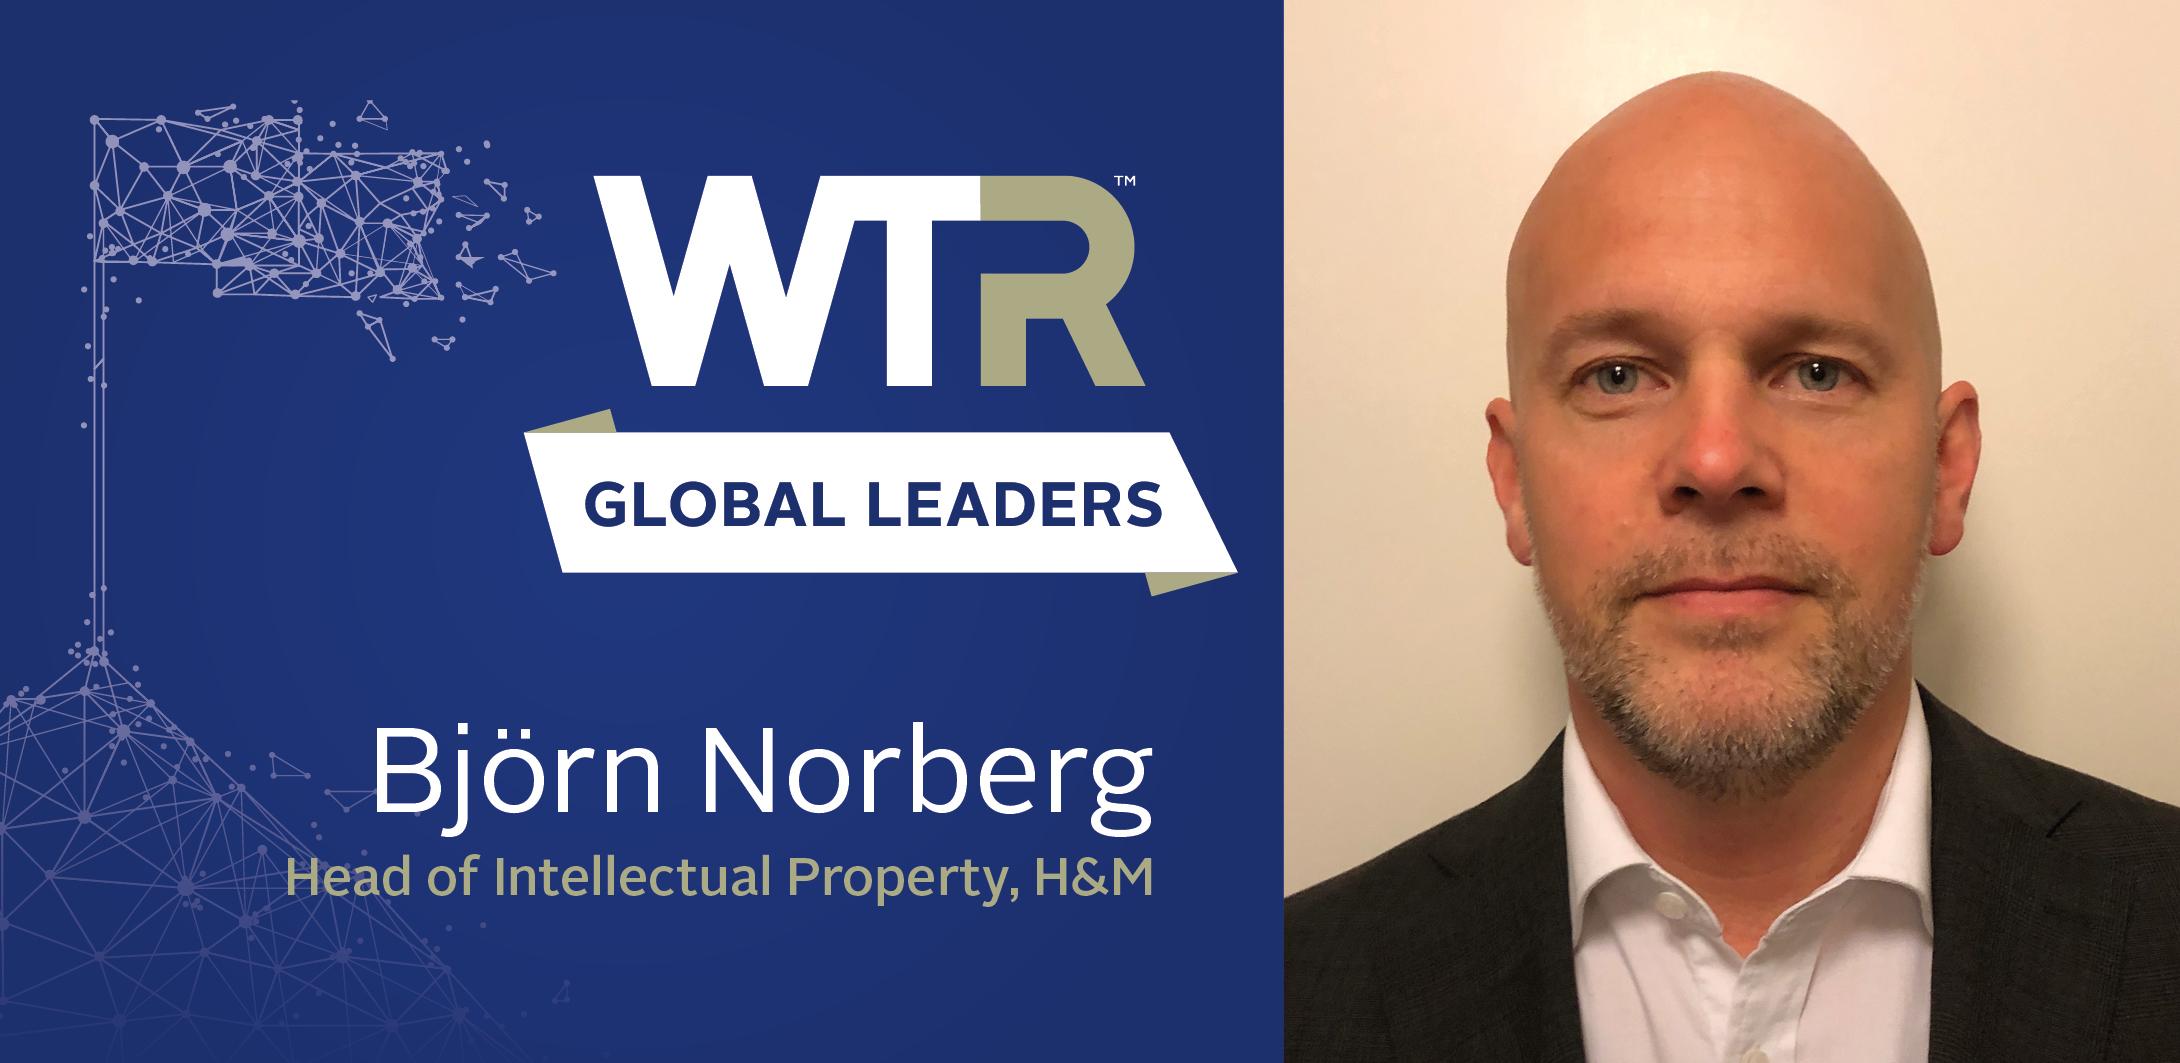 Björn Norberg